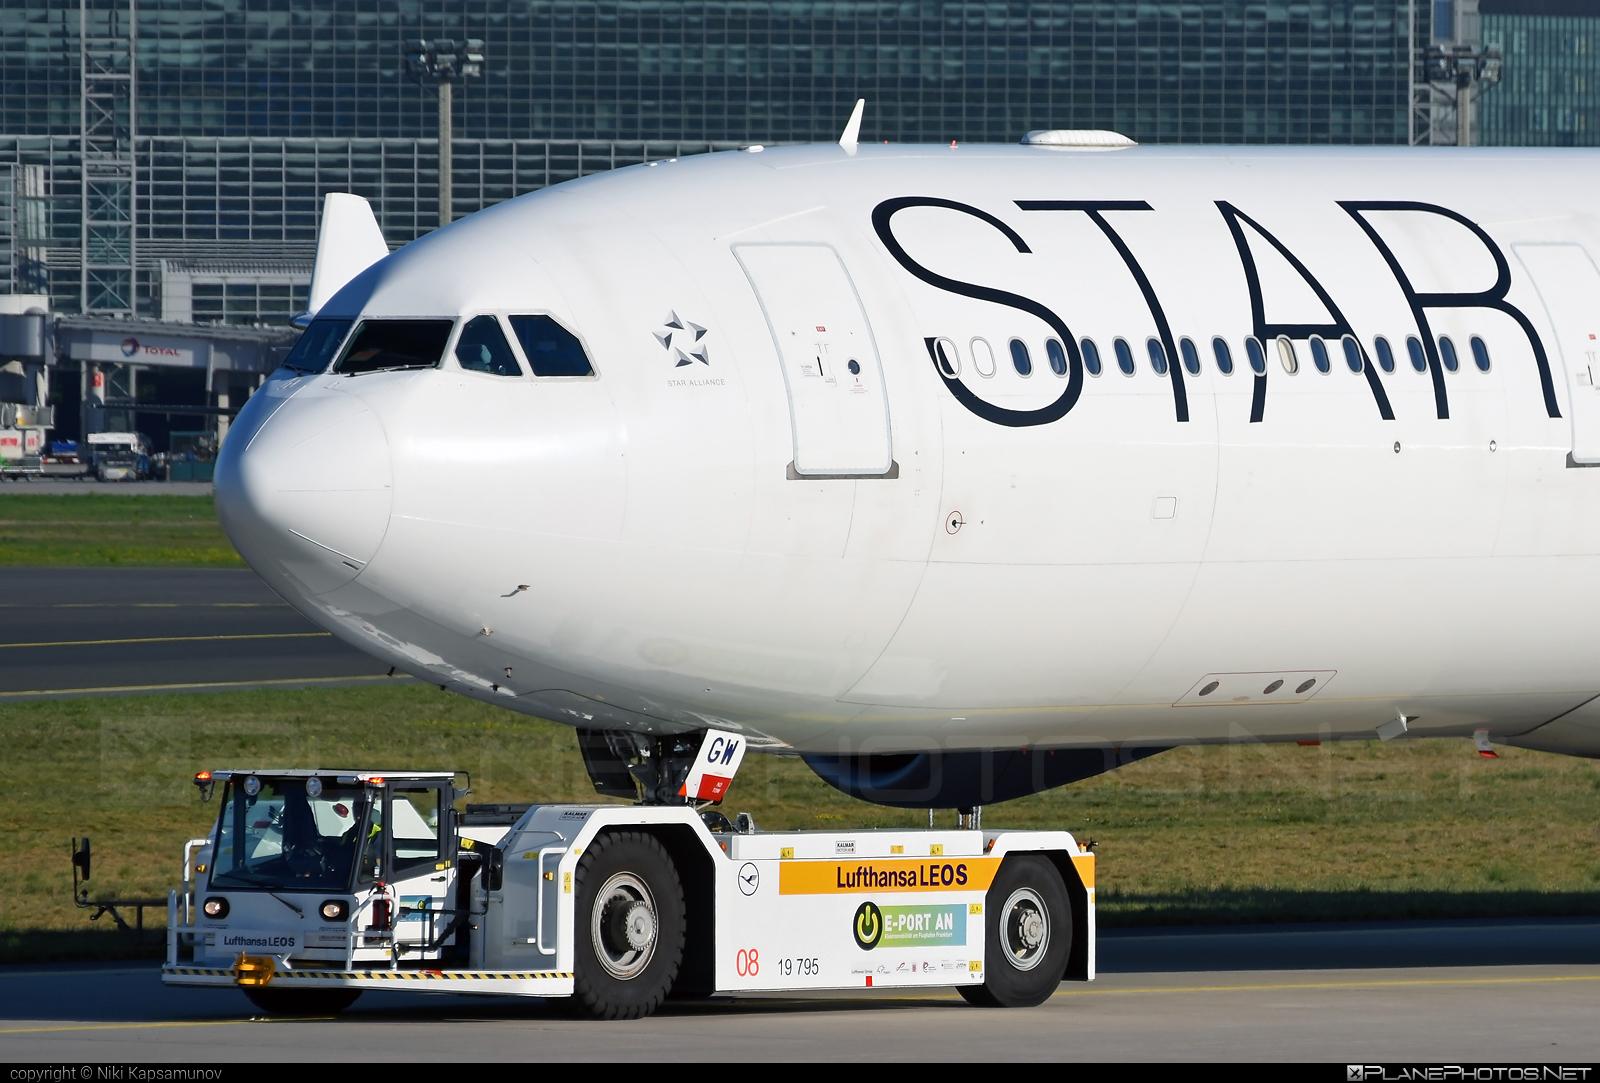 Airbus A340-313E - D-AIGW operated by Lufthansa #a340 #a340family #airbus #airbus340 #lufthansa #staralliance